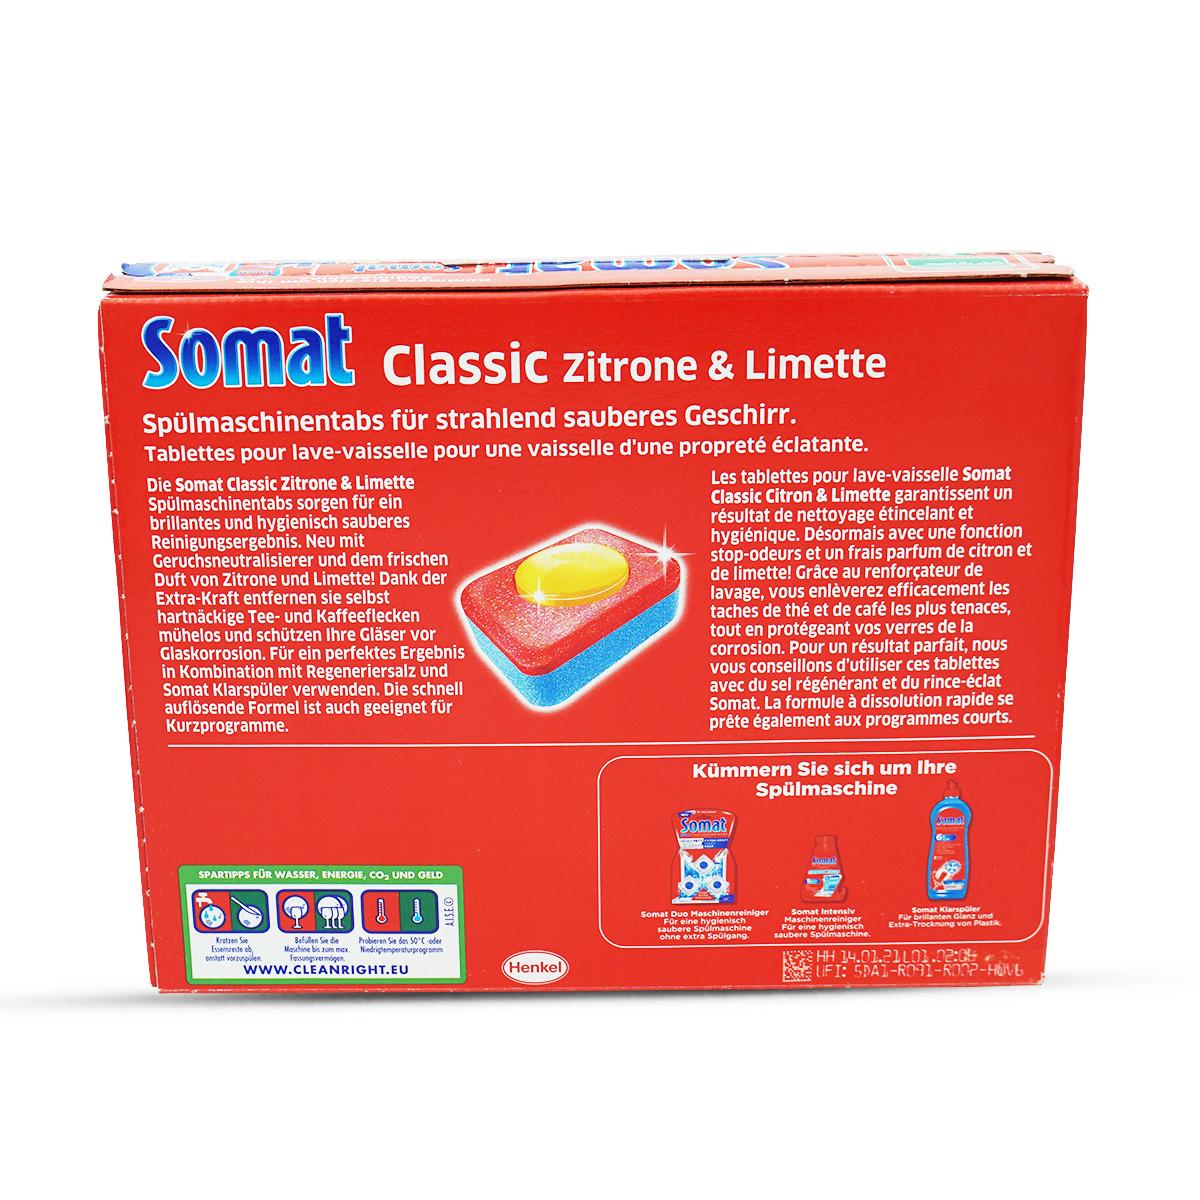 Somat Classic PLUS Zitrone, 38 Tabs